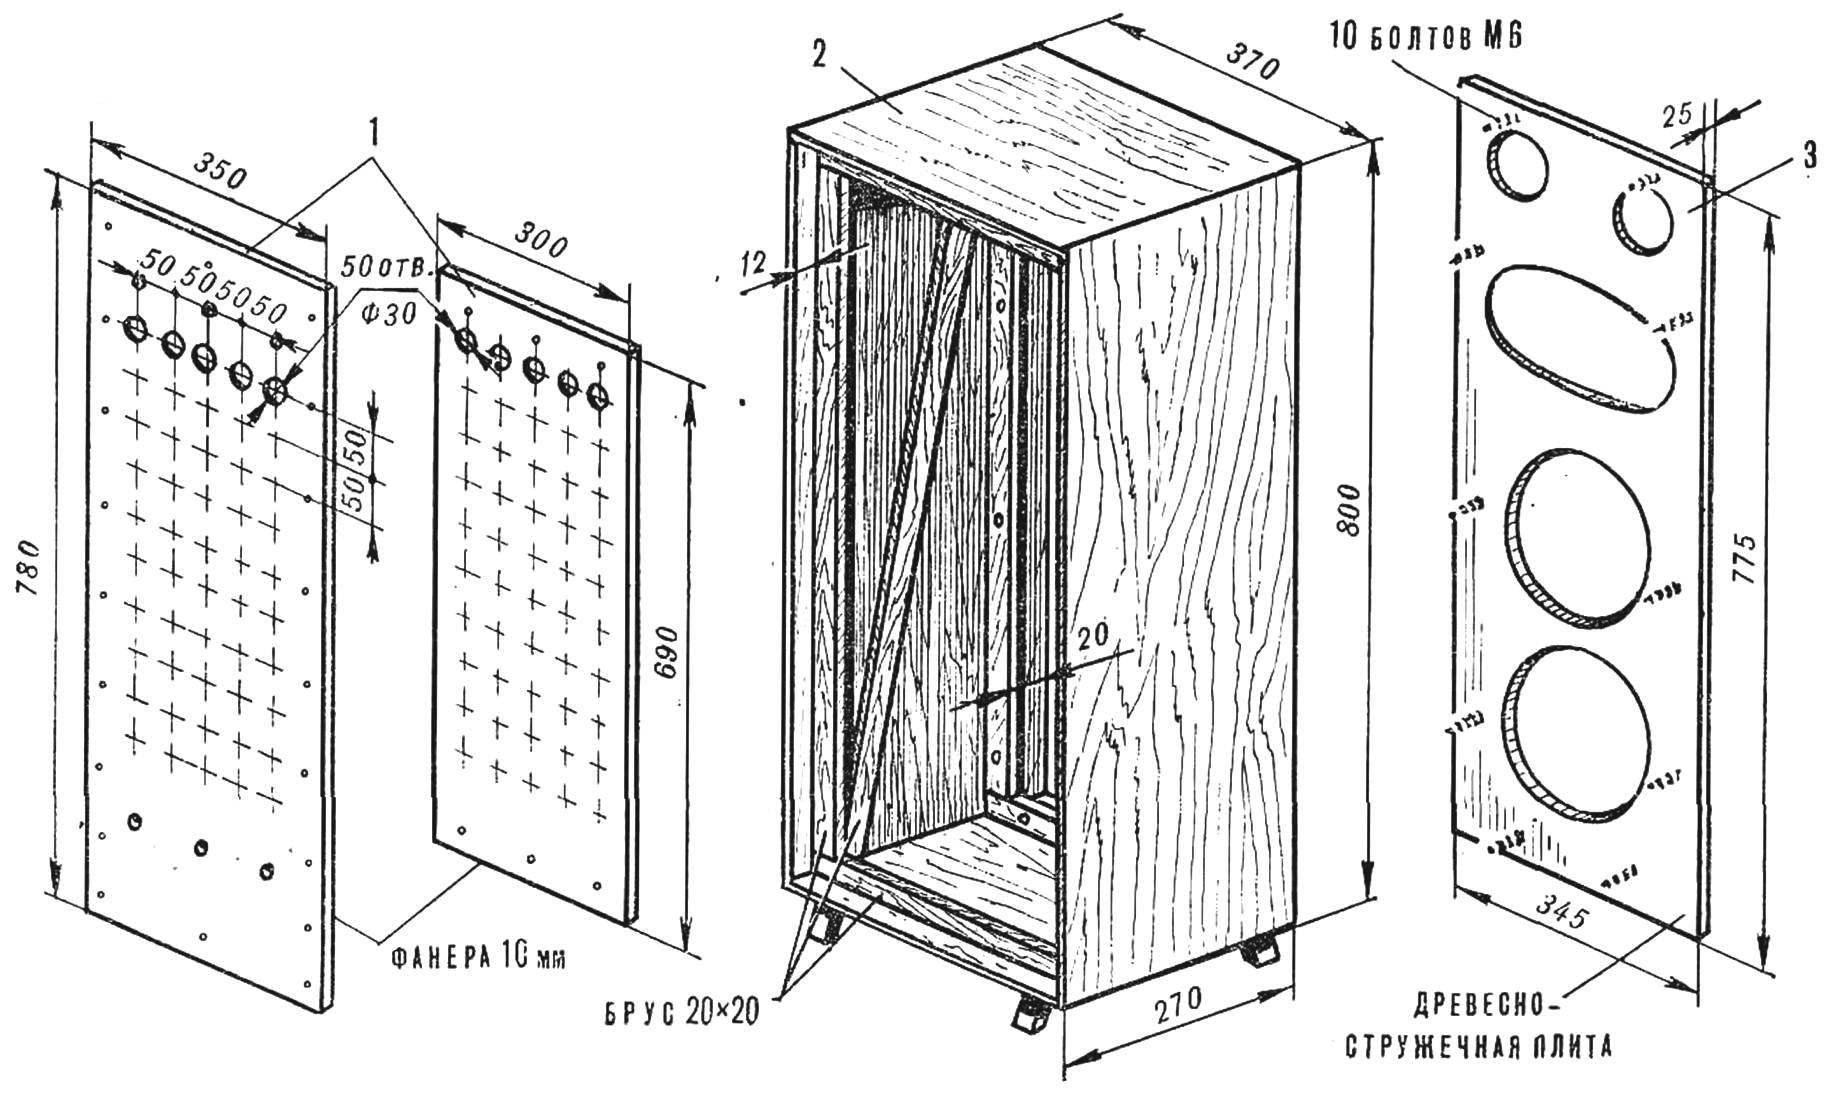 Fig. 1. Column design